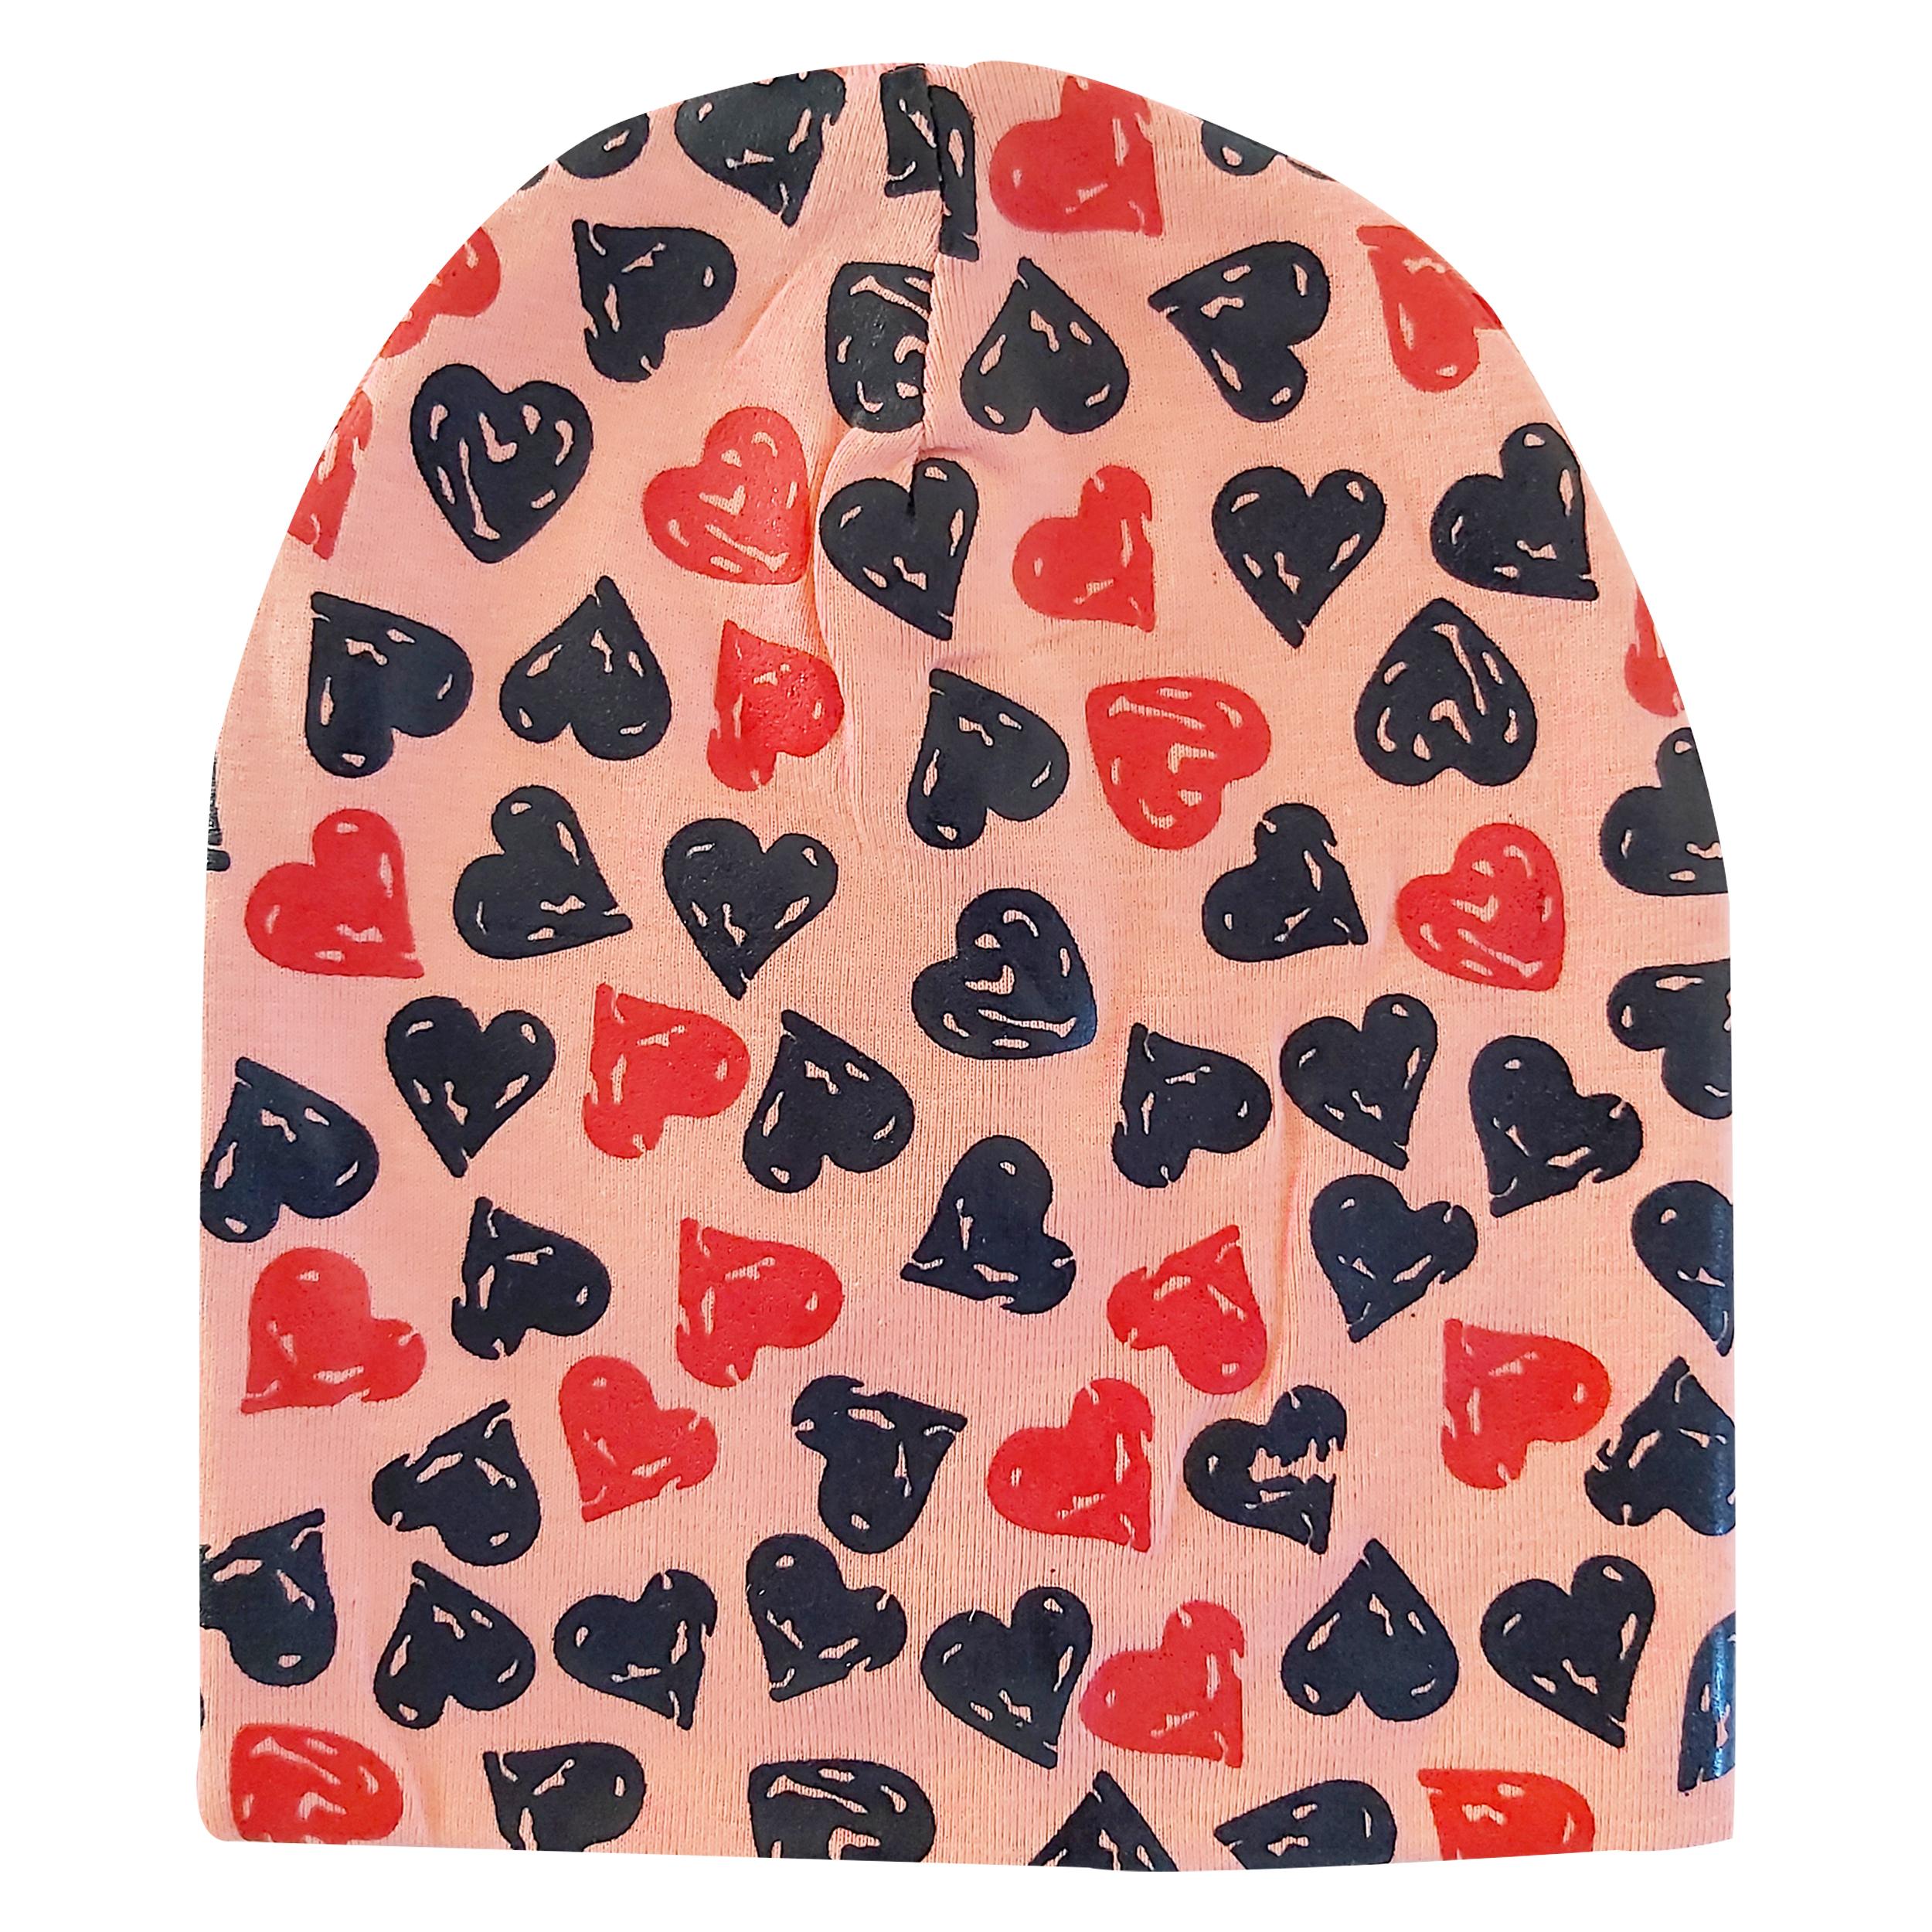 کلاه دخترانه مدل قلب کد ORP01 -  - 2